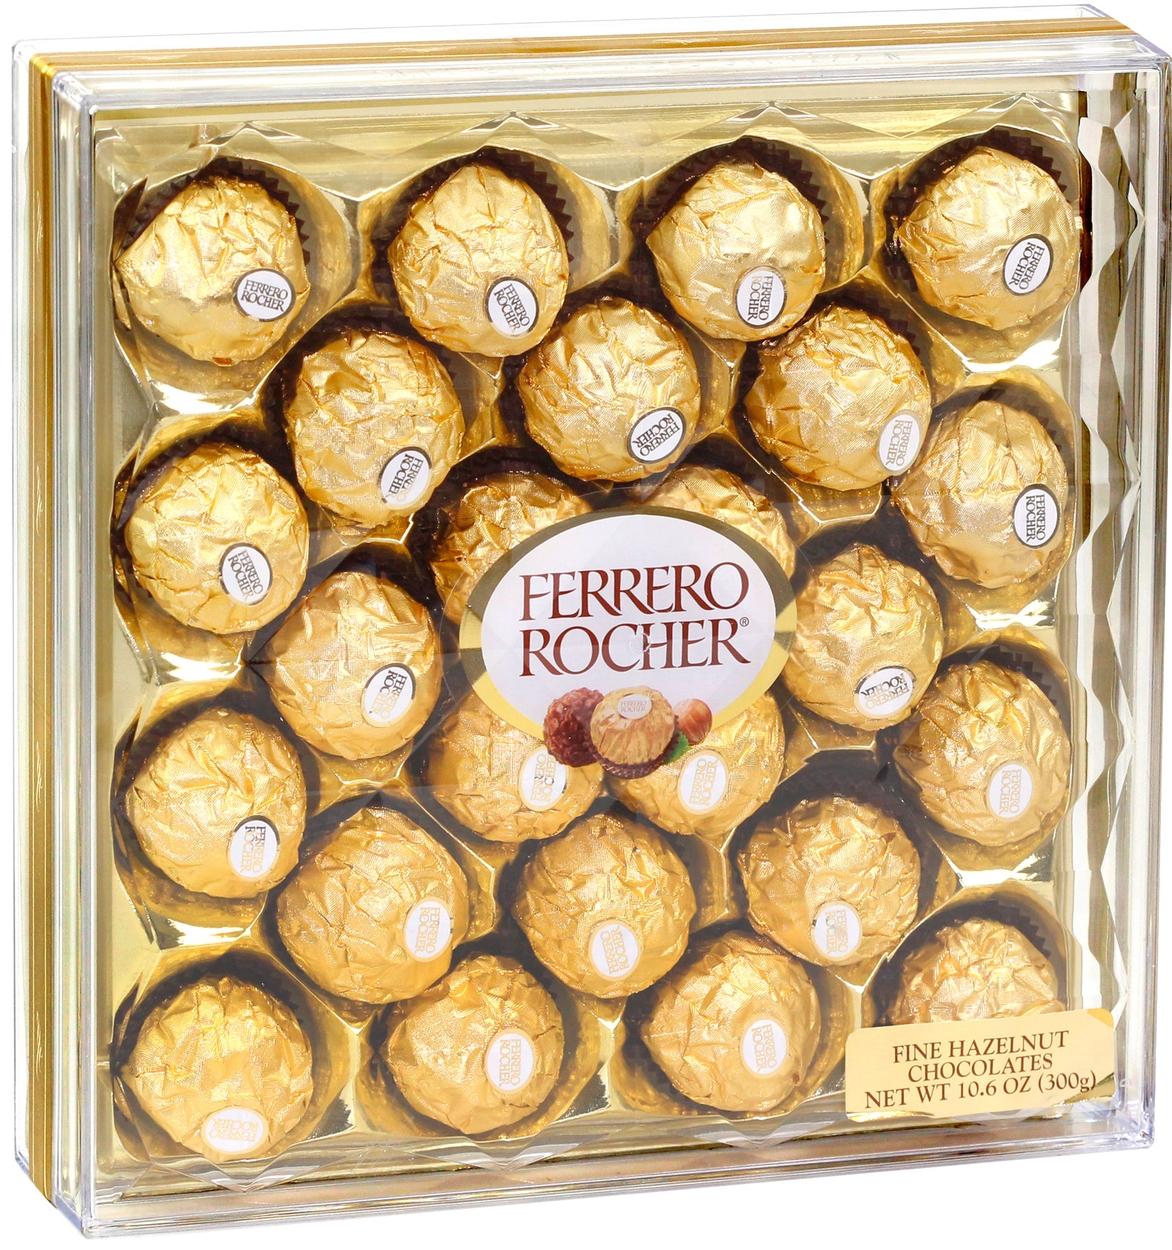 Ferrero Rocher Chocolate Truffle Gift Box - 24 Pc. • Oh! Nuts®